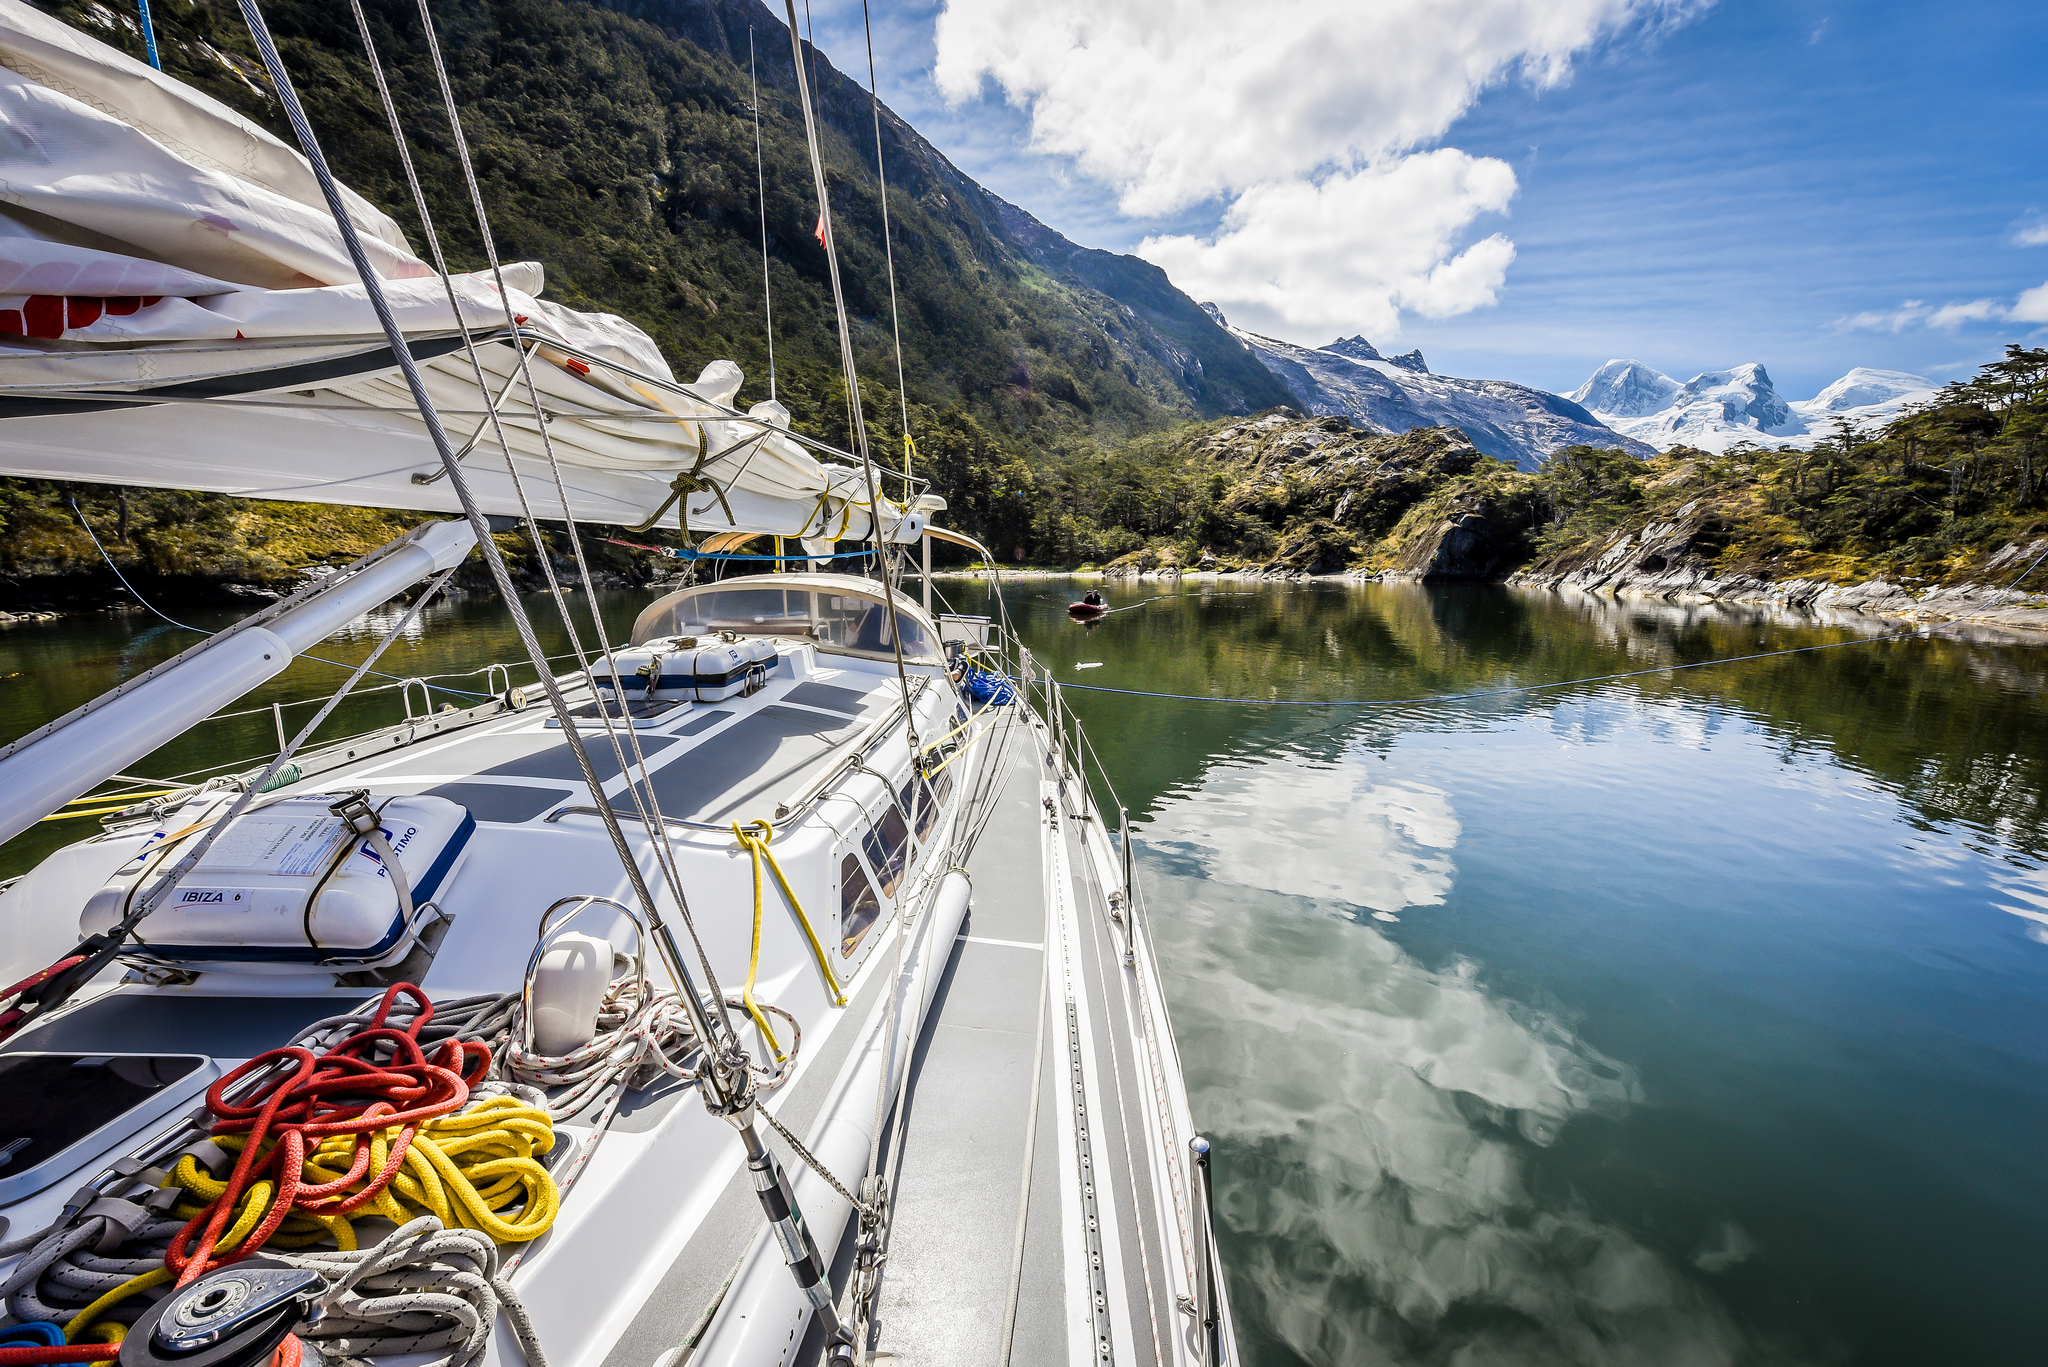 Patagonia 2016 - NashaChata II - Chalange 67